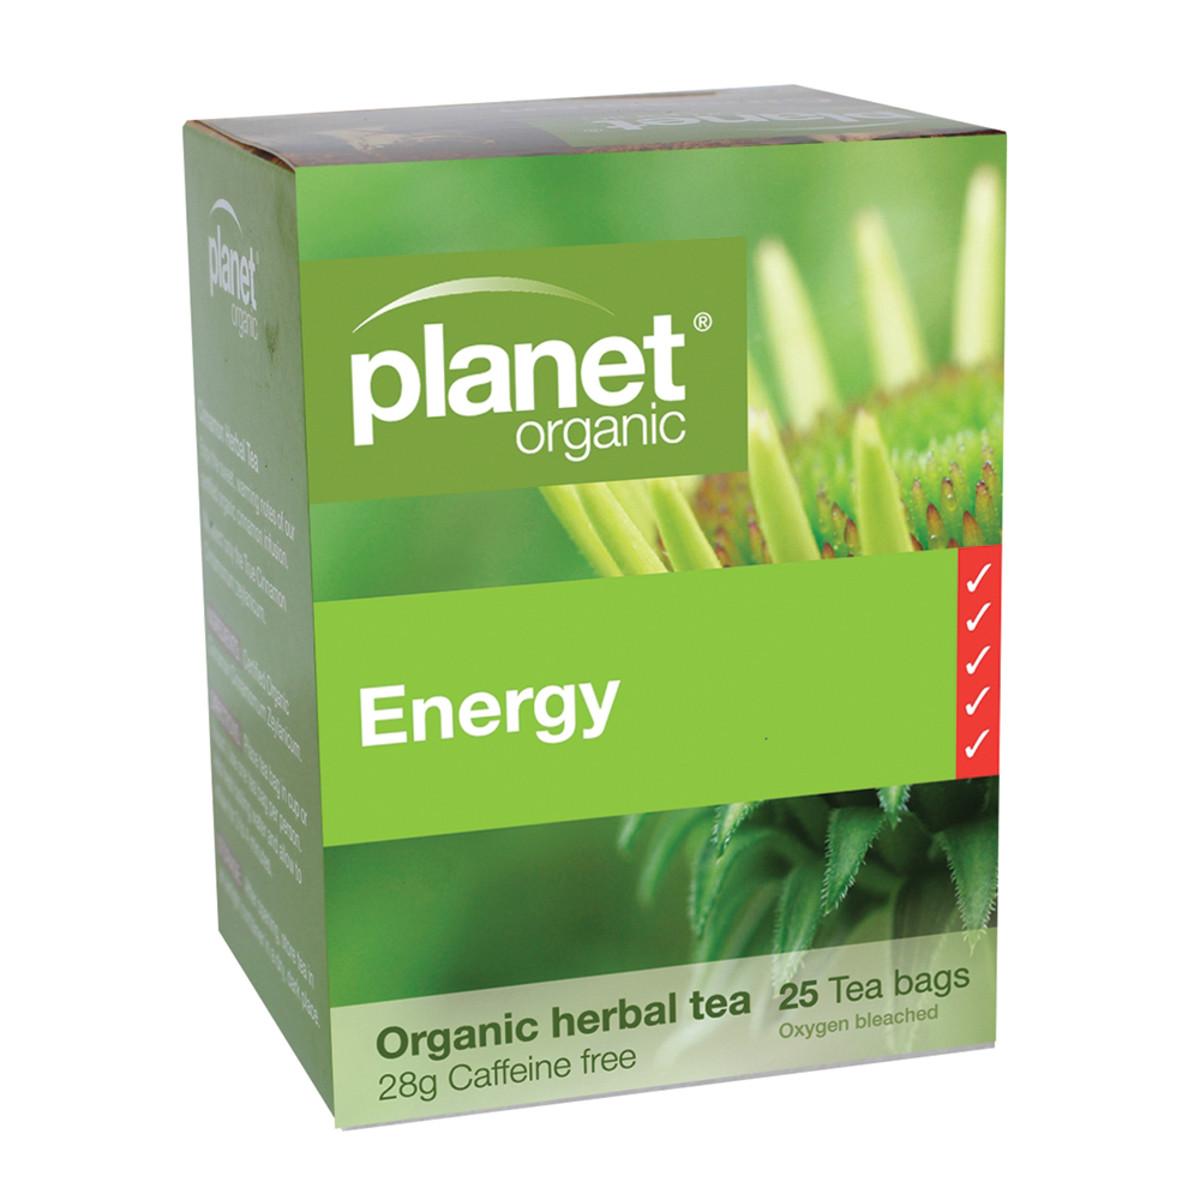 PLANET ORGANIC ENERGY TEA 25TB